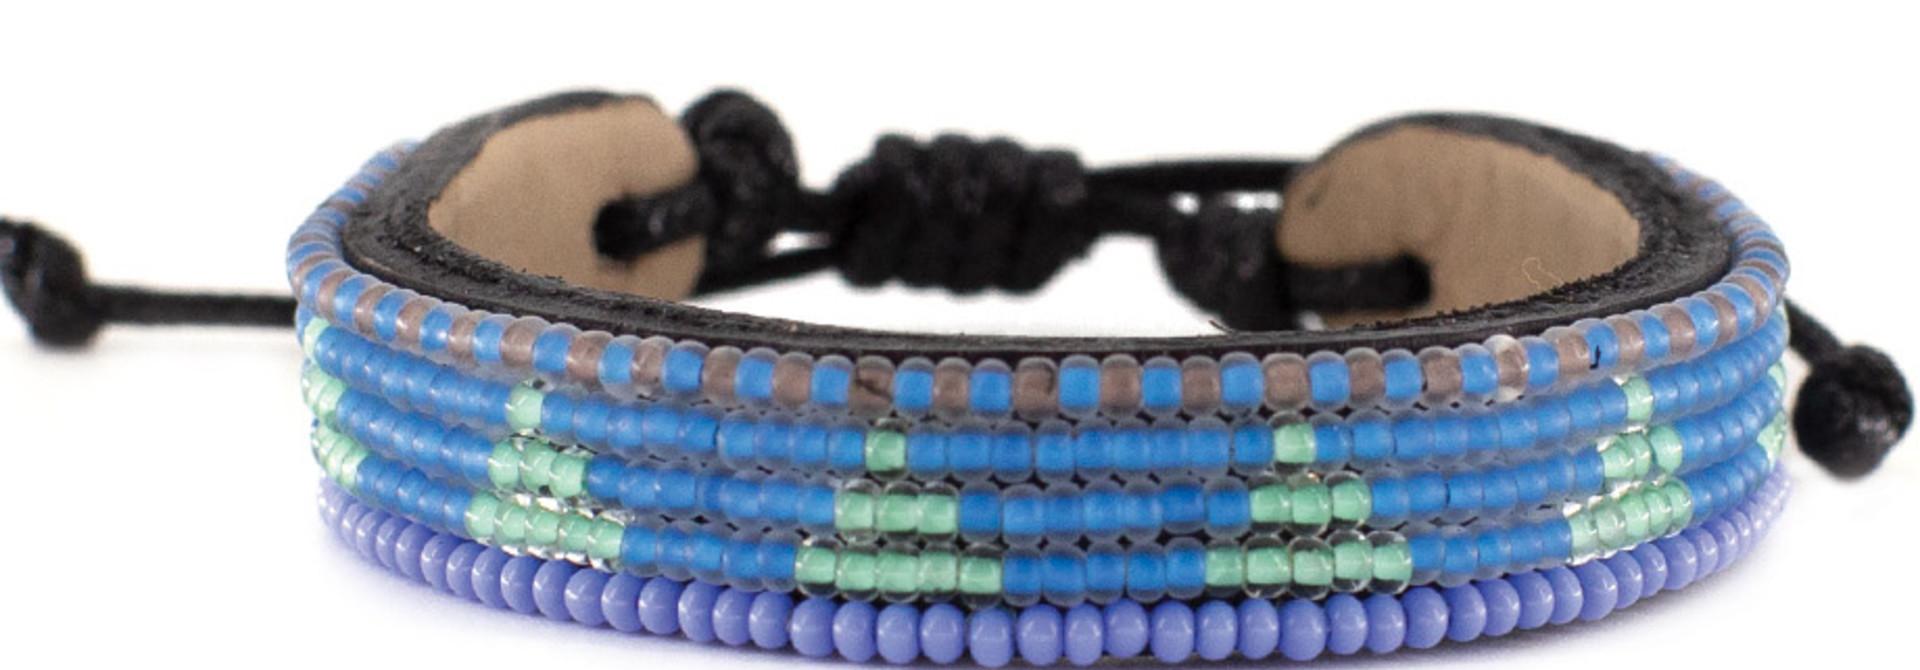 5 row Piramidi Bracelet SeaBlue/Turquoise